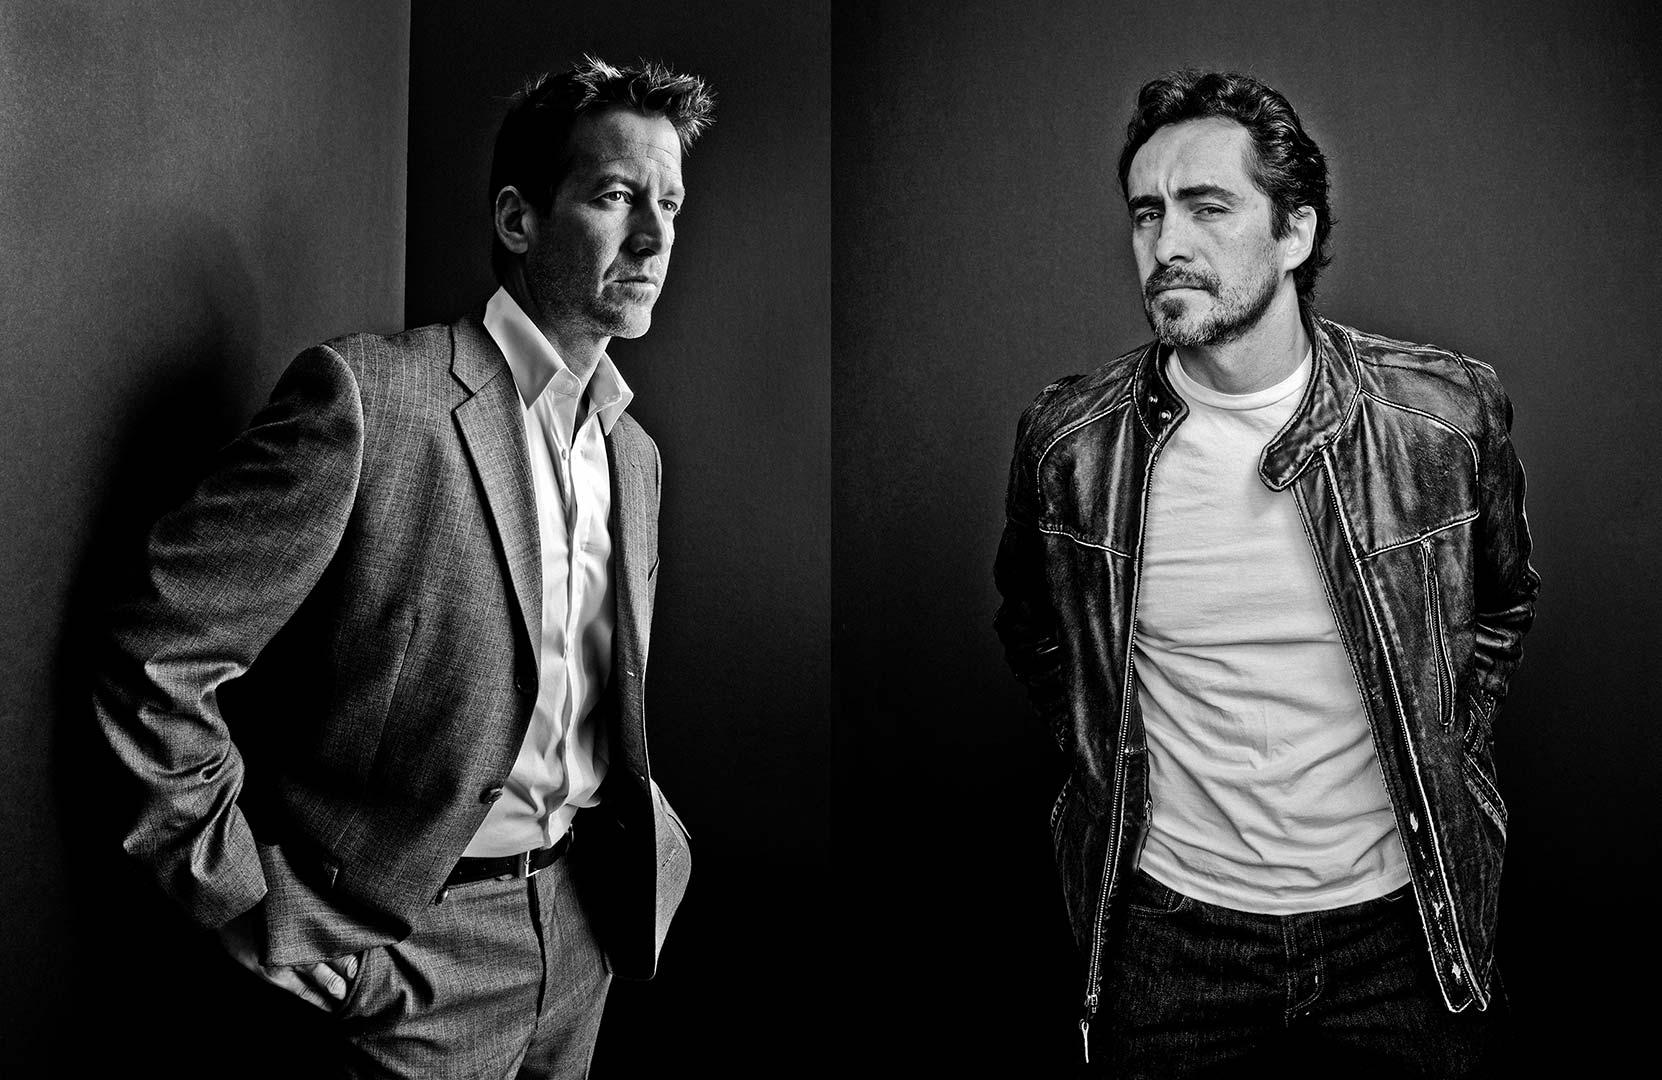 black & white portrait photography of actors James Denton and Demian Bichir